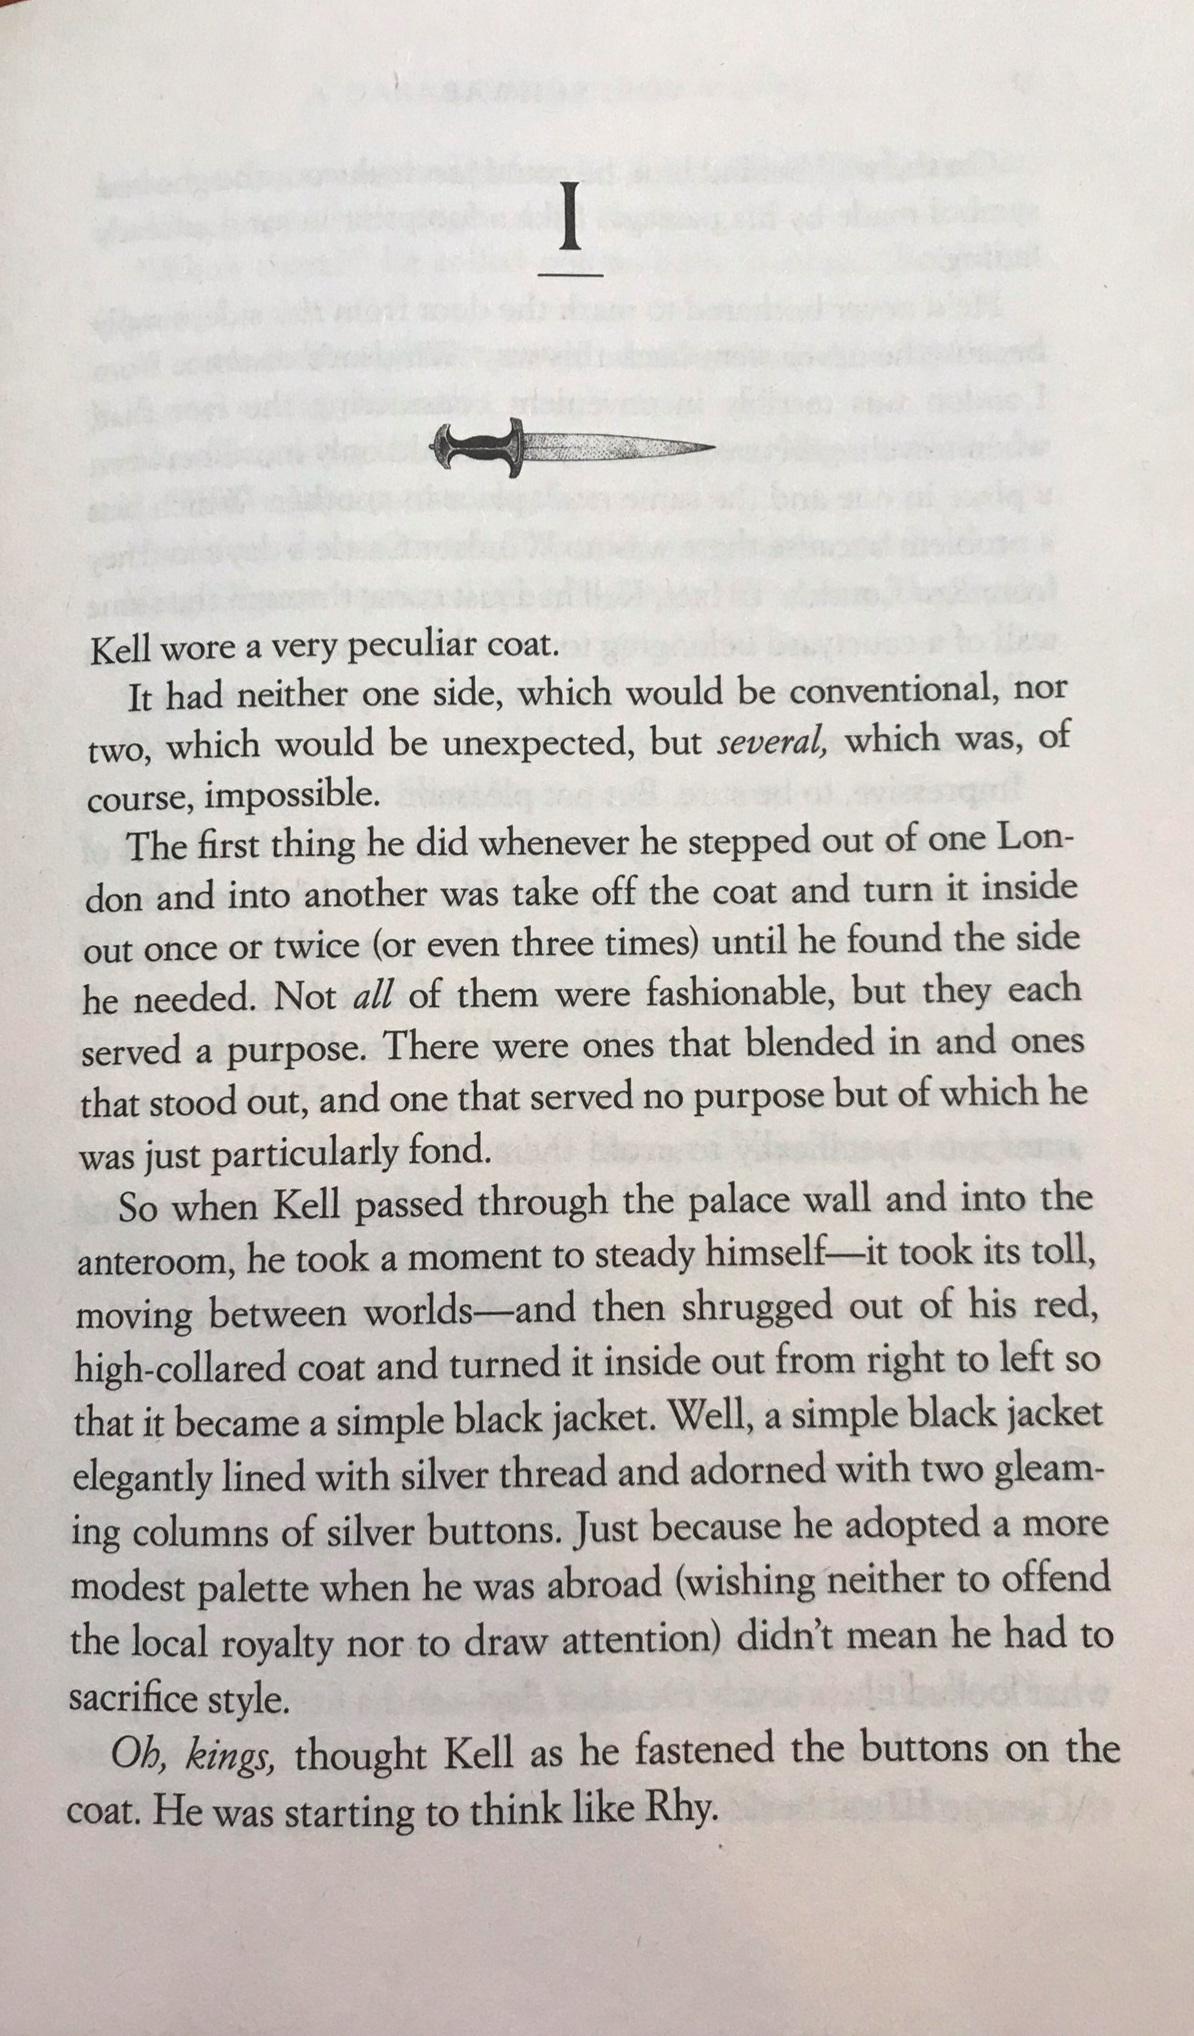 A Darker Shade of Magic Dr Bookworm Excerpt2.jpeg